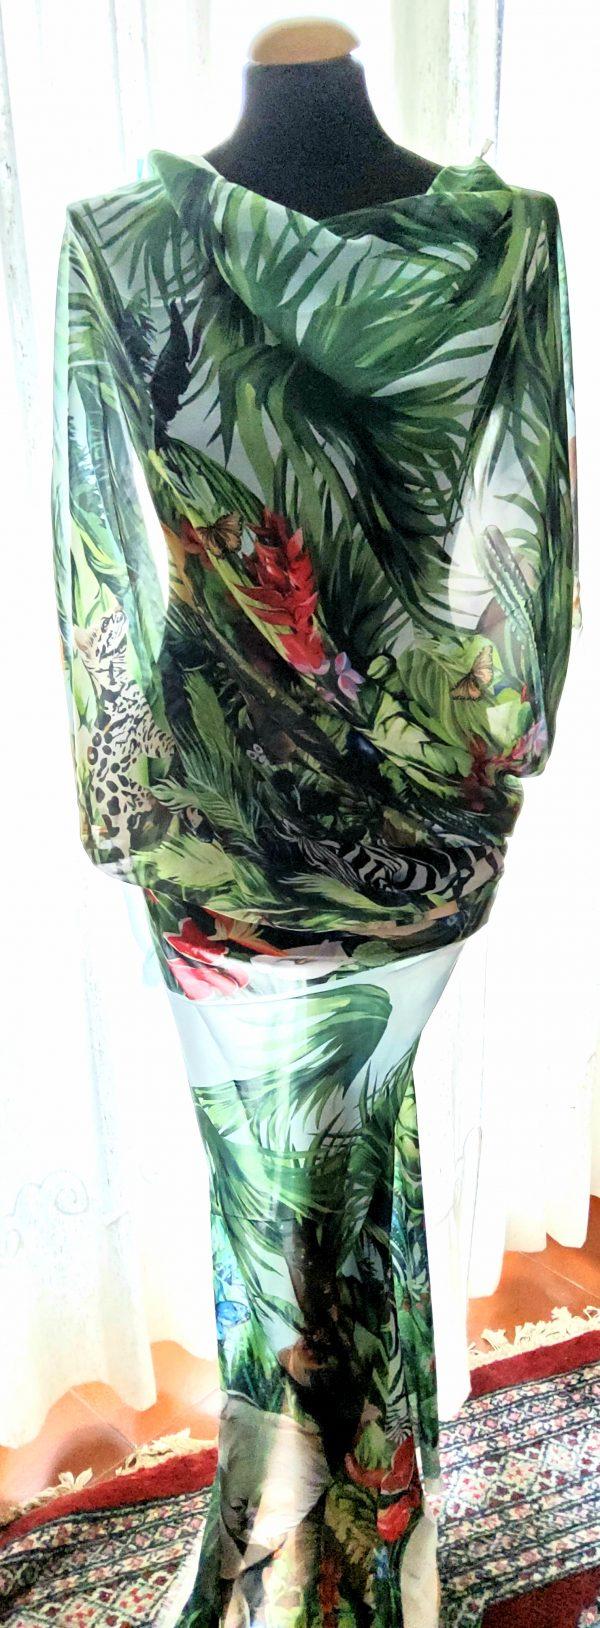 20200308 193616 Jungle Elephant Print Chiffon fabric/ 2020collection fabric/Italian Designer Fabrics 12